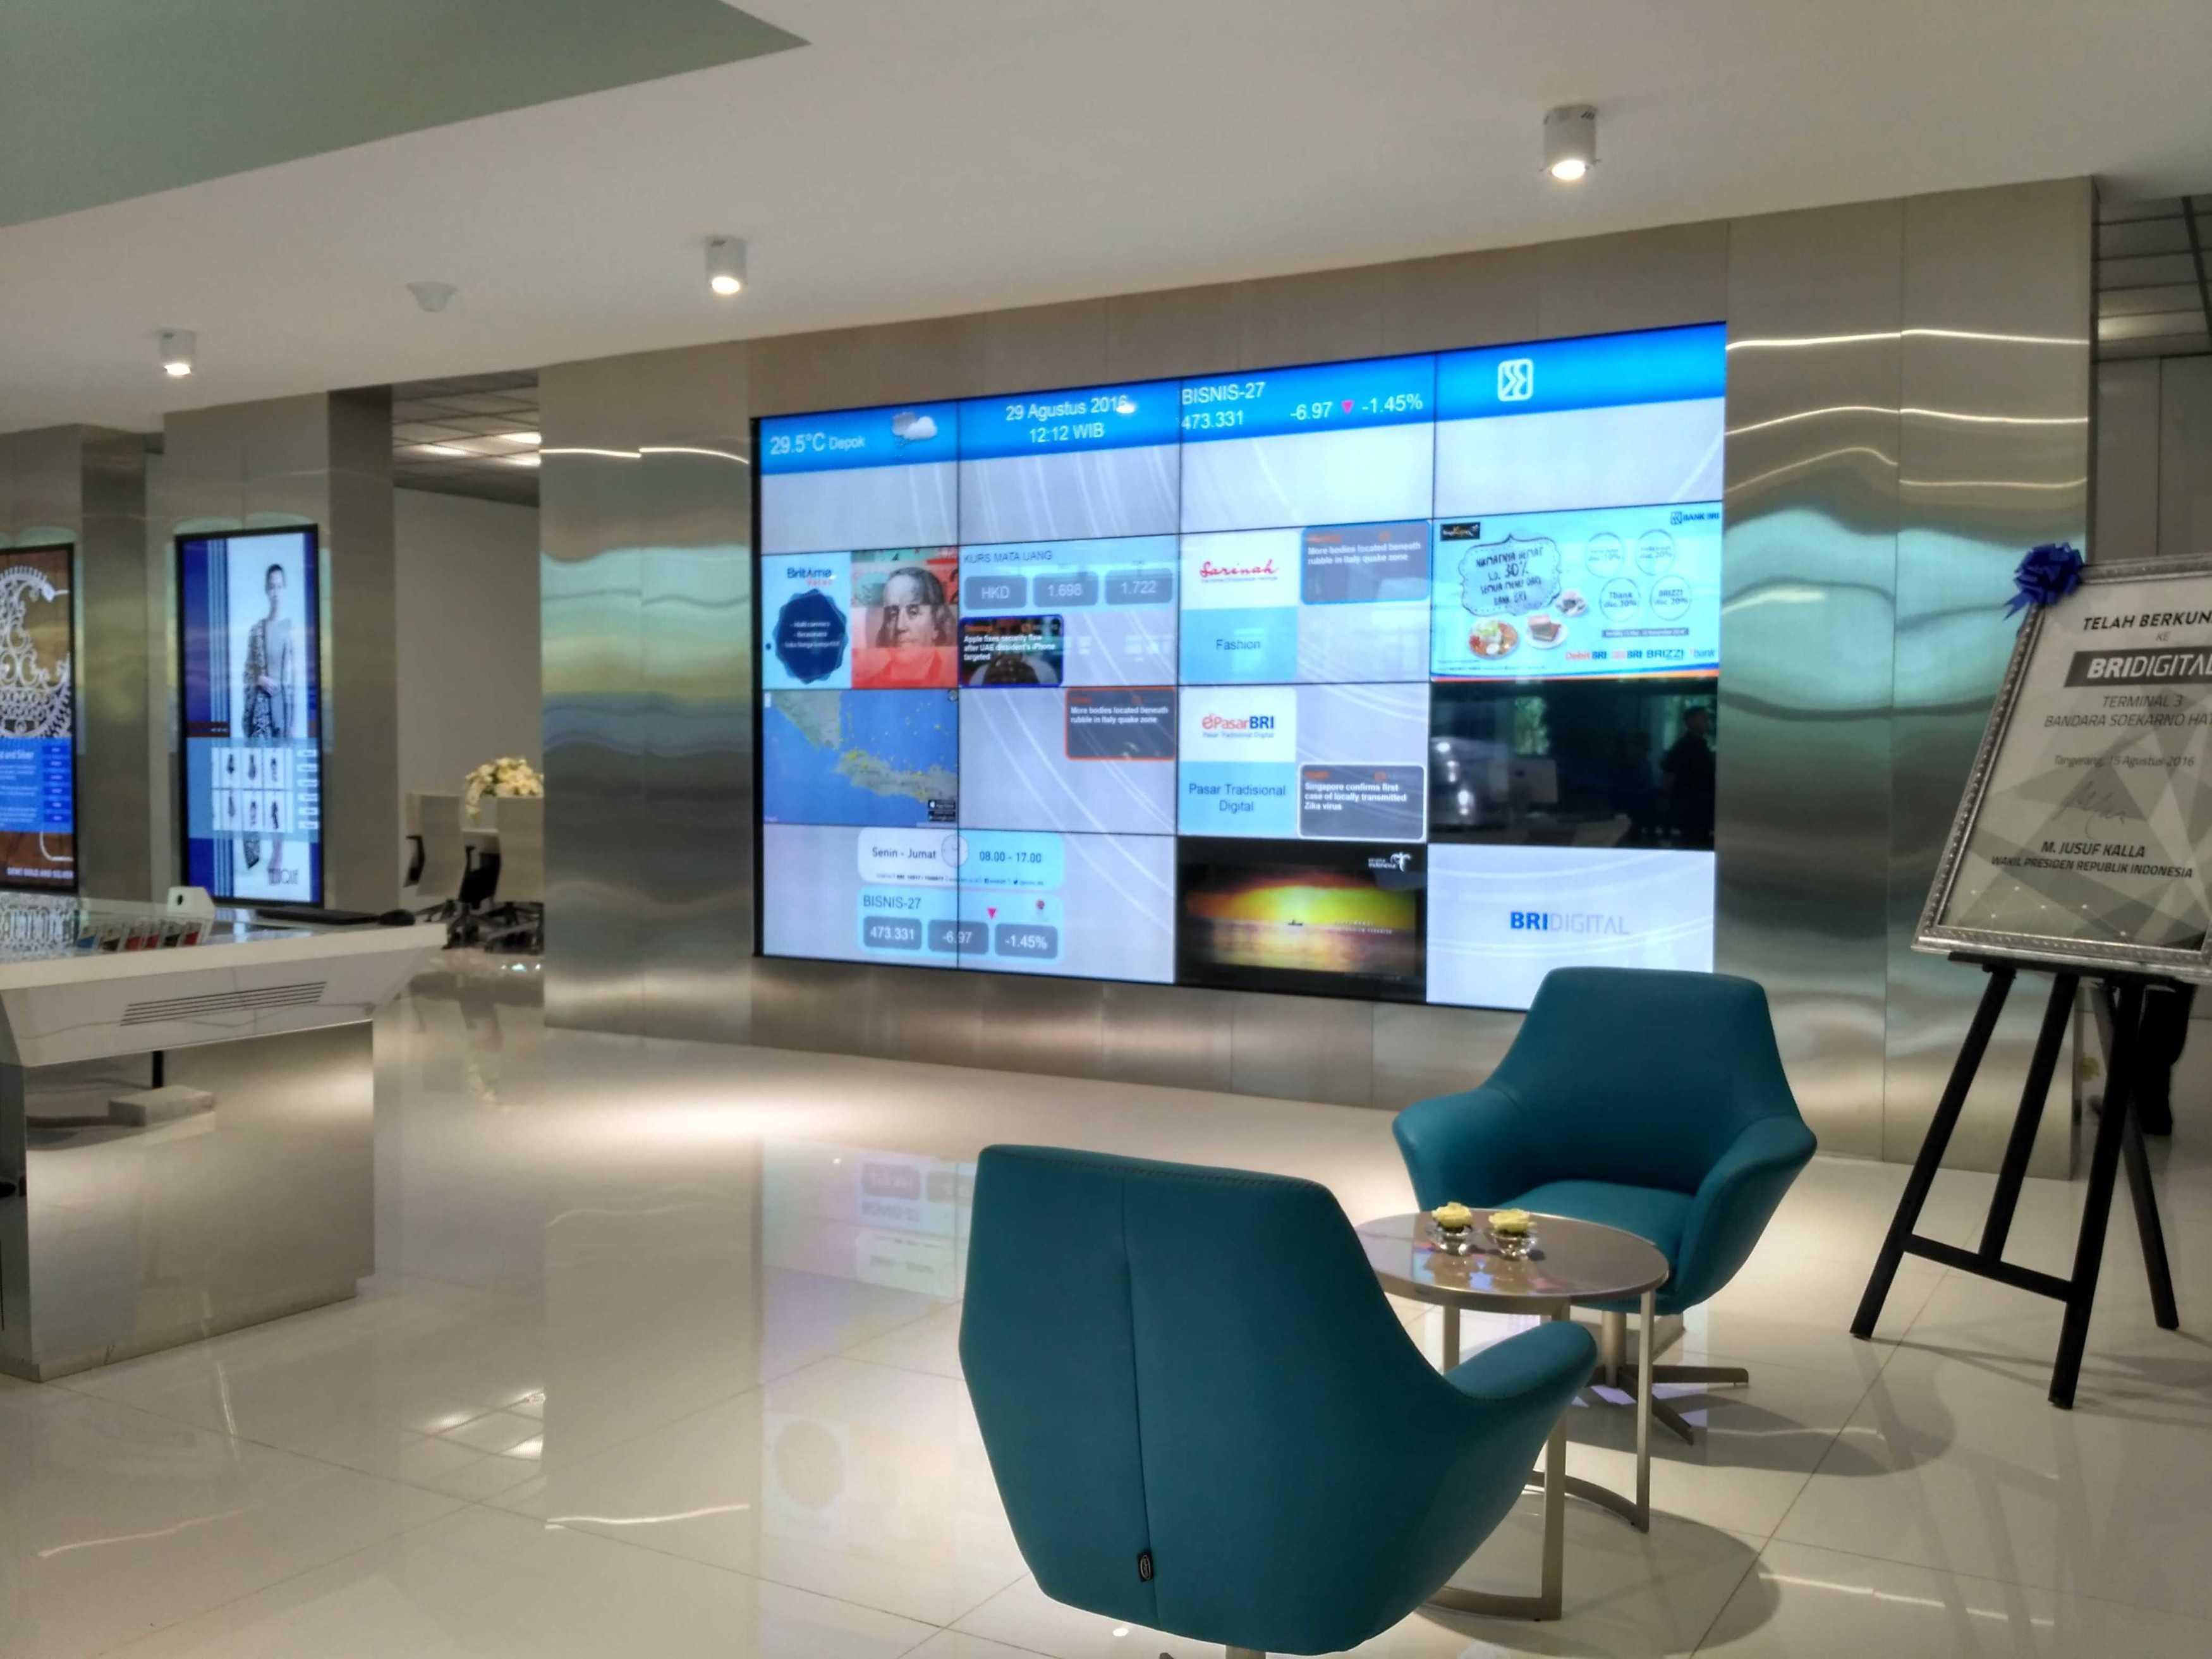 Axon90 The Design Hub Bri Digital Bank Terminal 3 Ultimate, Soekarno Hatta Bandara, Cengkareng Terminal 3 Ultimate, Soekarno Hatta Bandara, Cengkareng Lobby Modern  9768